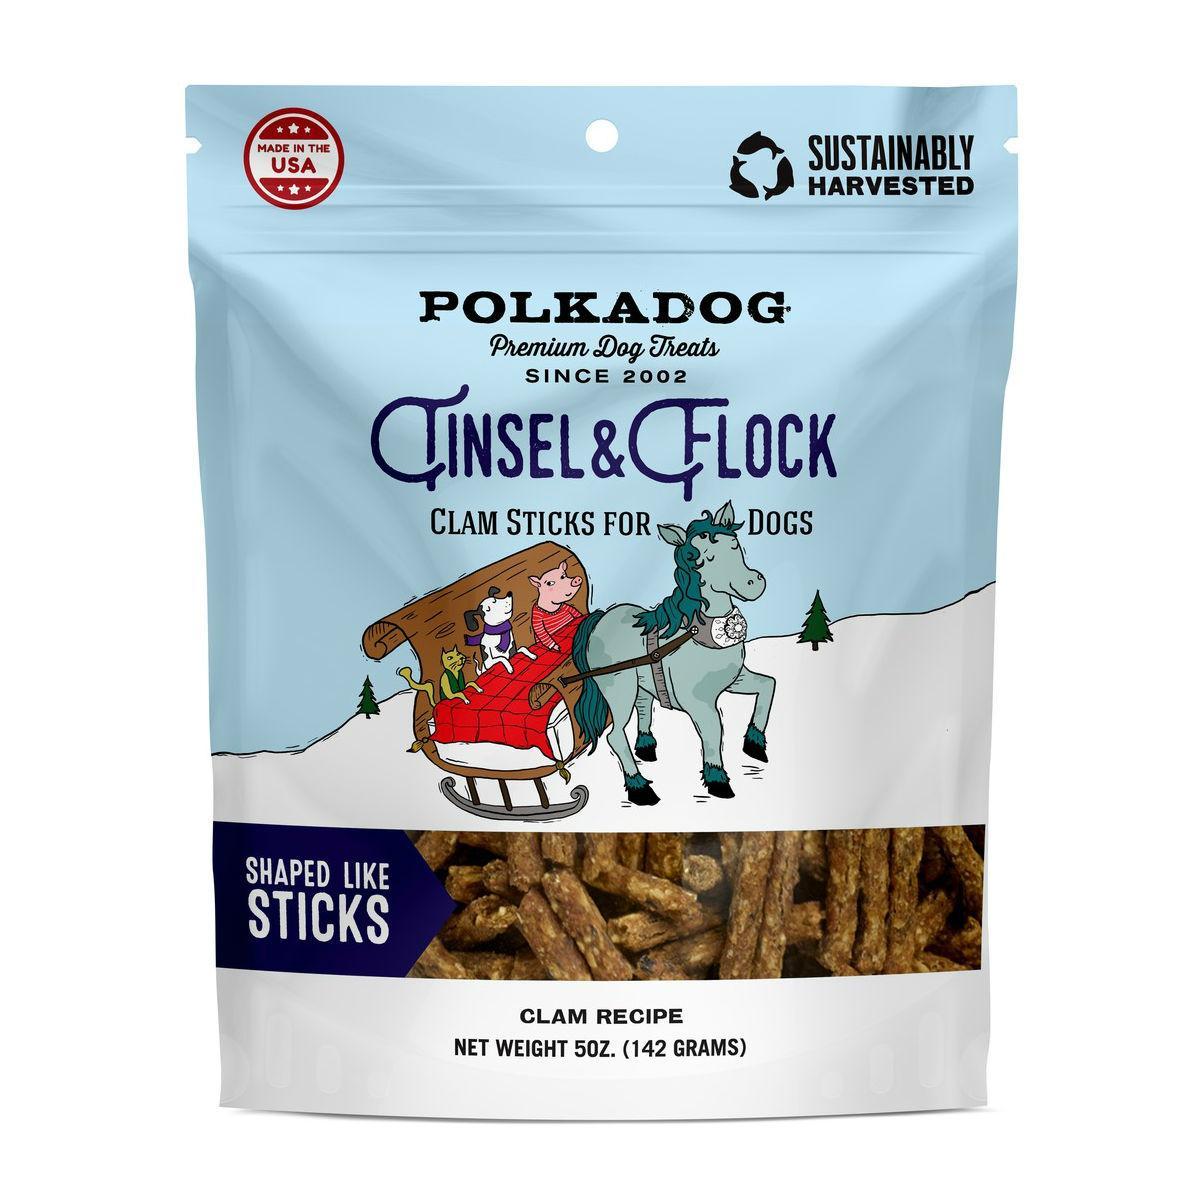 Polkadog Tinsel & Flock Holiday Dog Treat - Clam Recipe Sticks